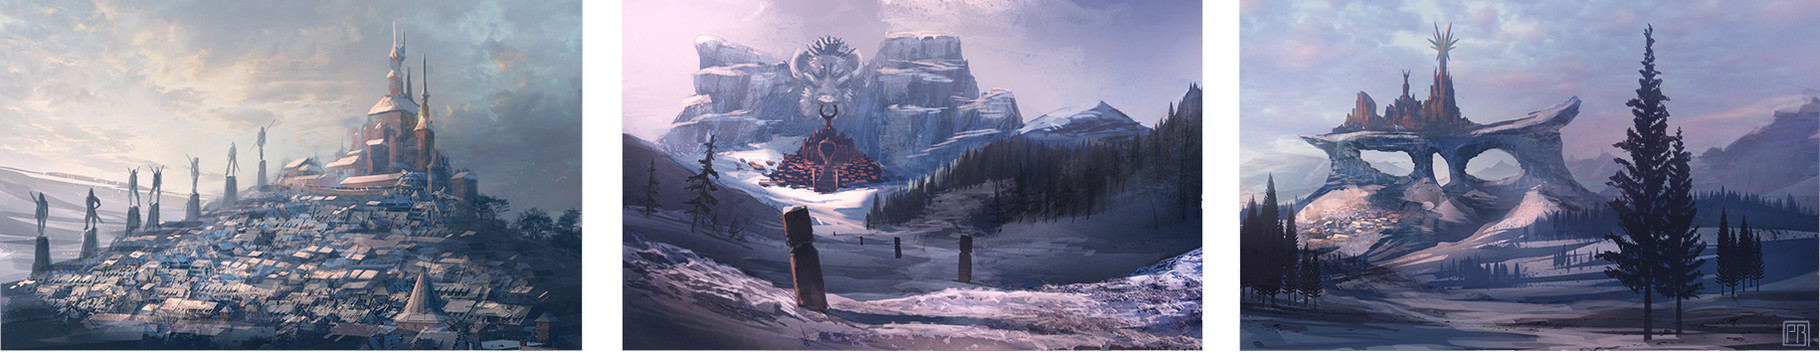 Snowy Castles - Peter Bartels- Illustration - Concept Art